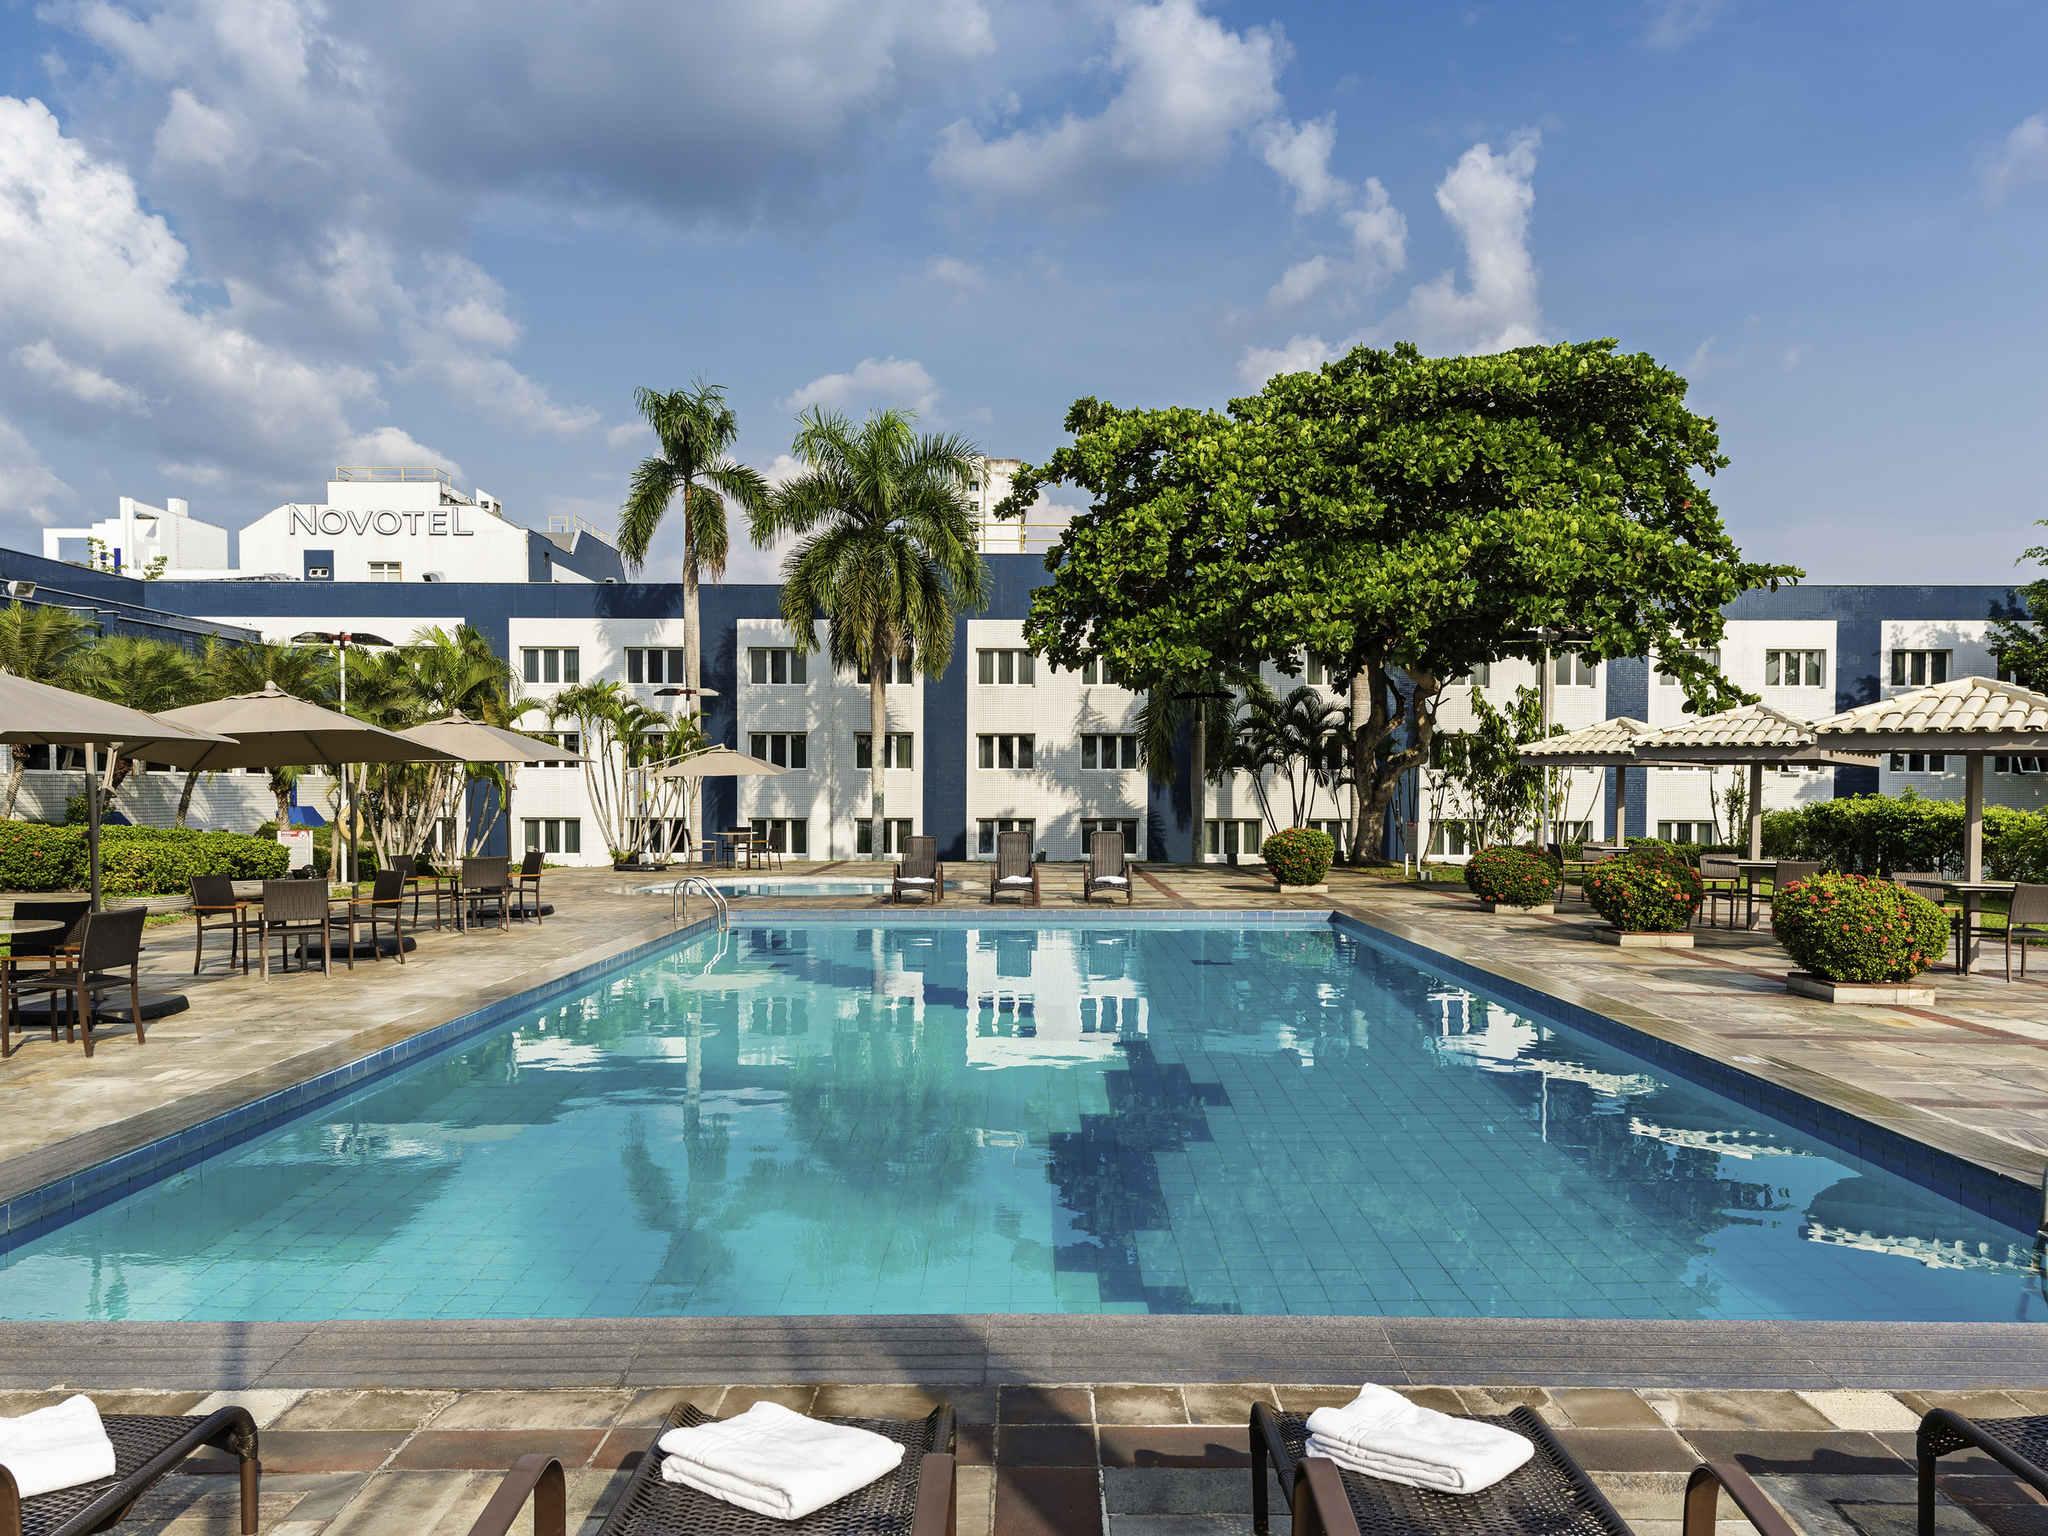 Hotell – Novotel Manaus